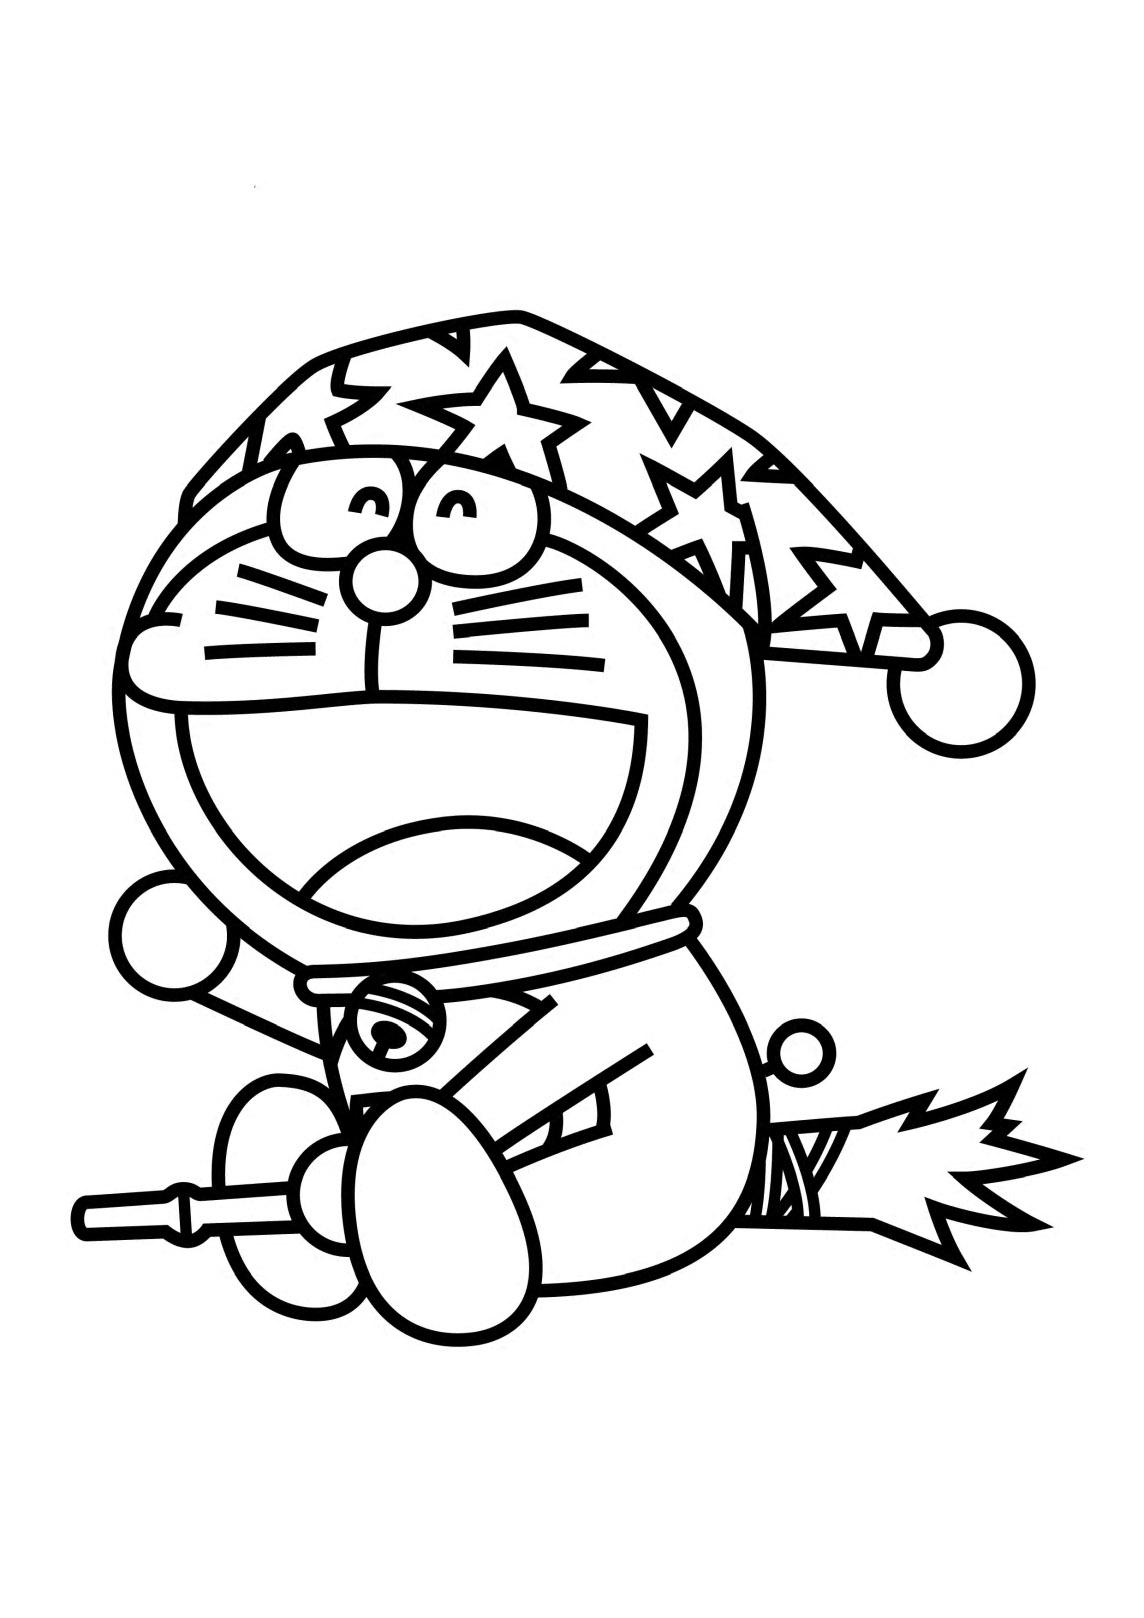 Desenho de doraemon no halloween para colorir tudodesenhos for Doraemon immagini da colorare